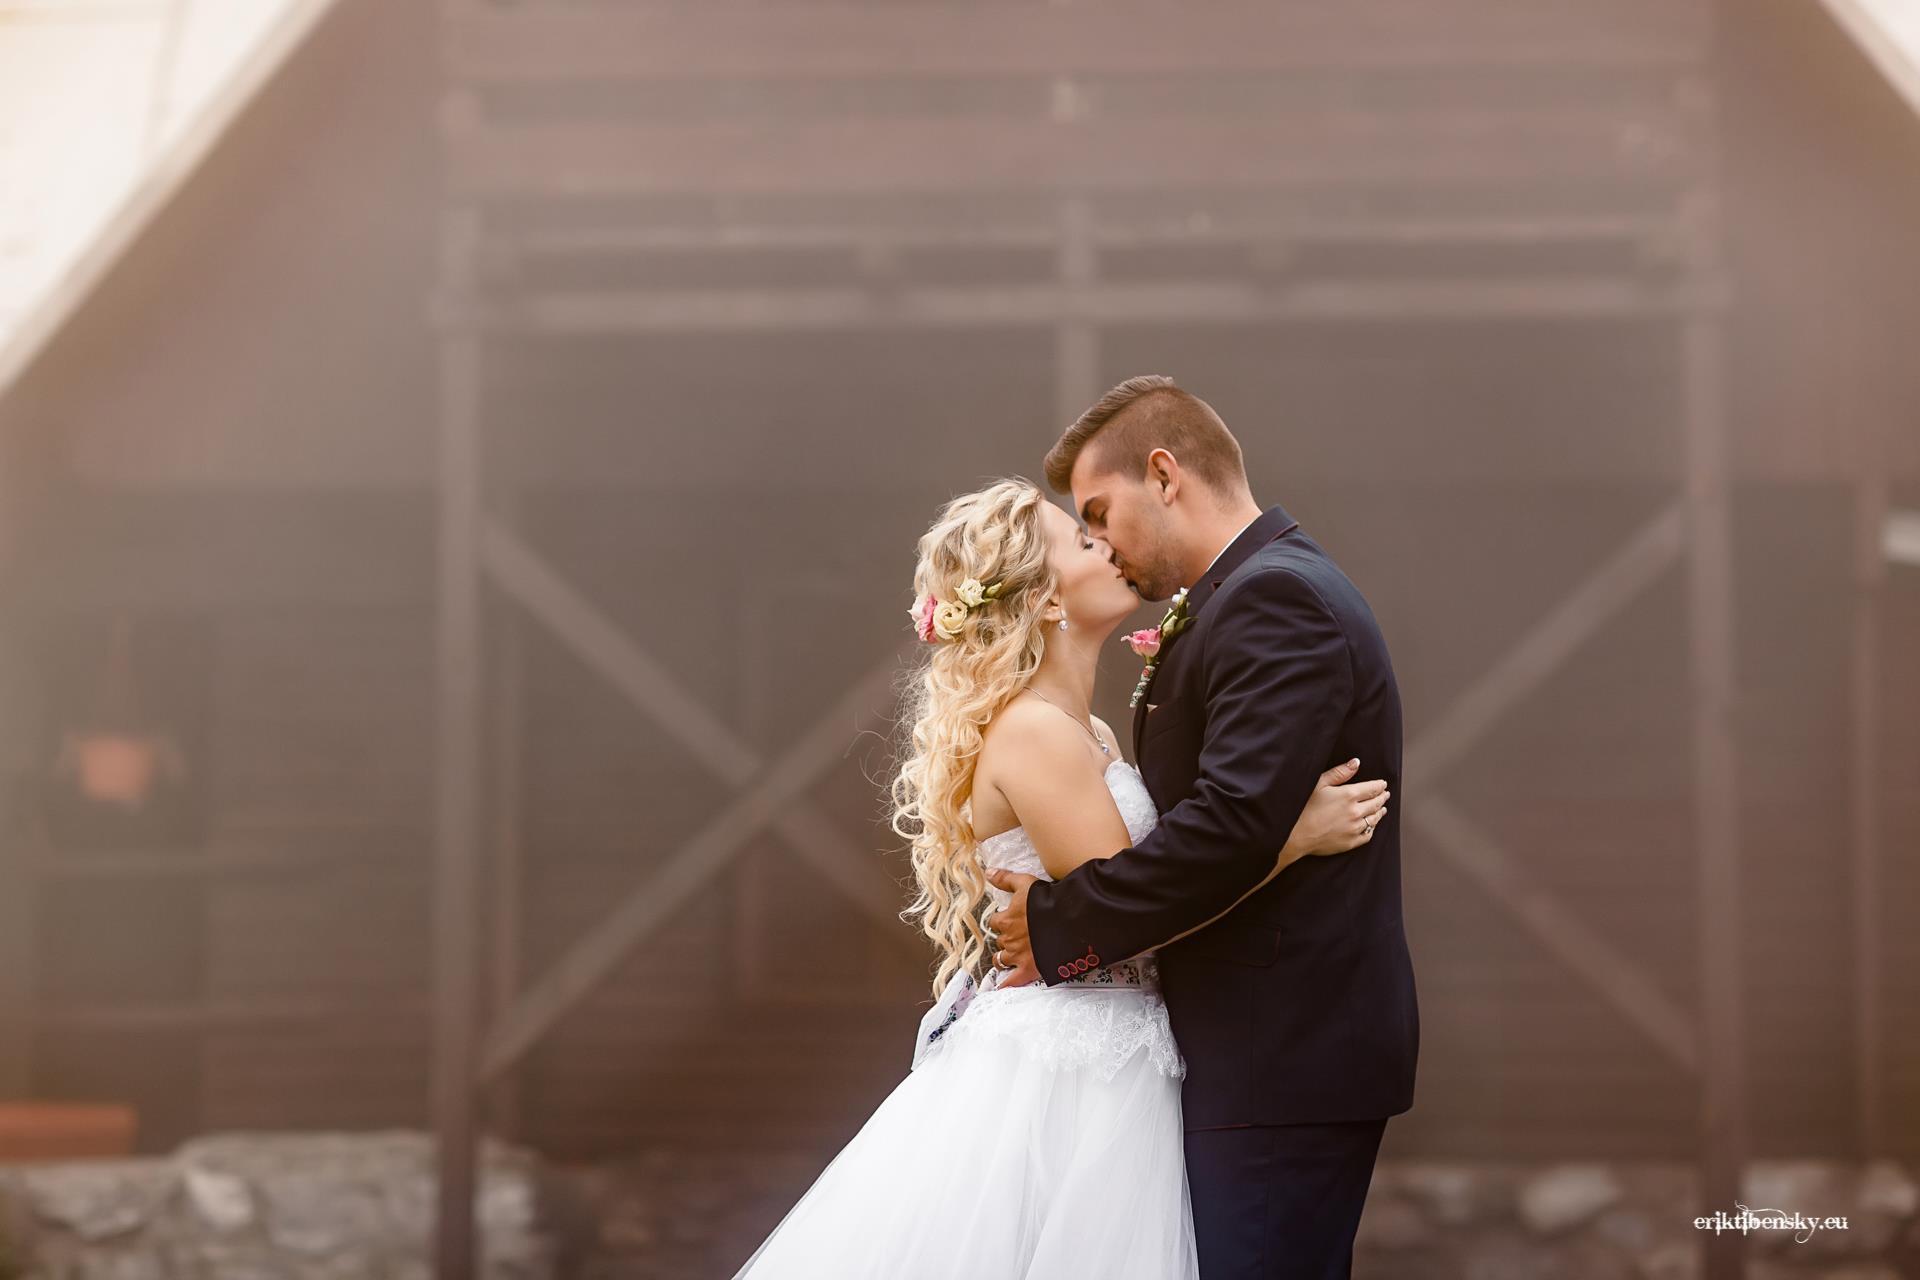 eriktibensky-eu-fotograf-wedding-photo-svadba-svadobny-pezinok-bratislava-modra-senec-1003